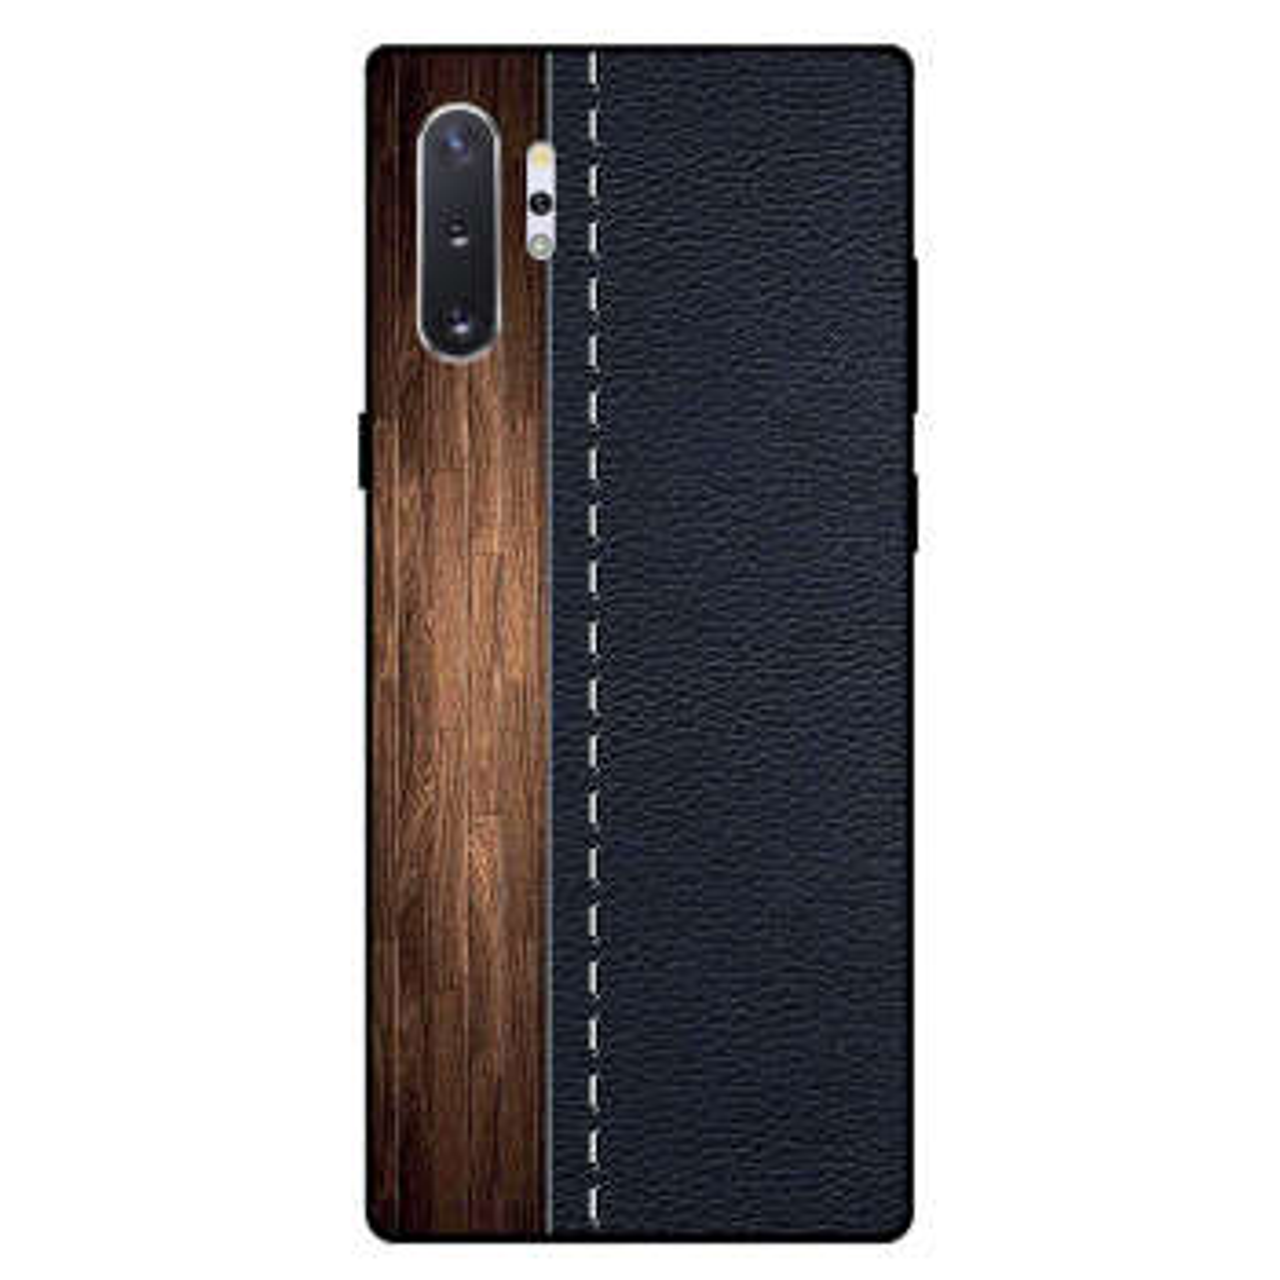 کاور کی اچ کد 4080 مناسب برای گوشی موبایل سامسونگ  Galaxy Note 10 Plus